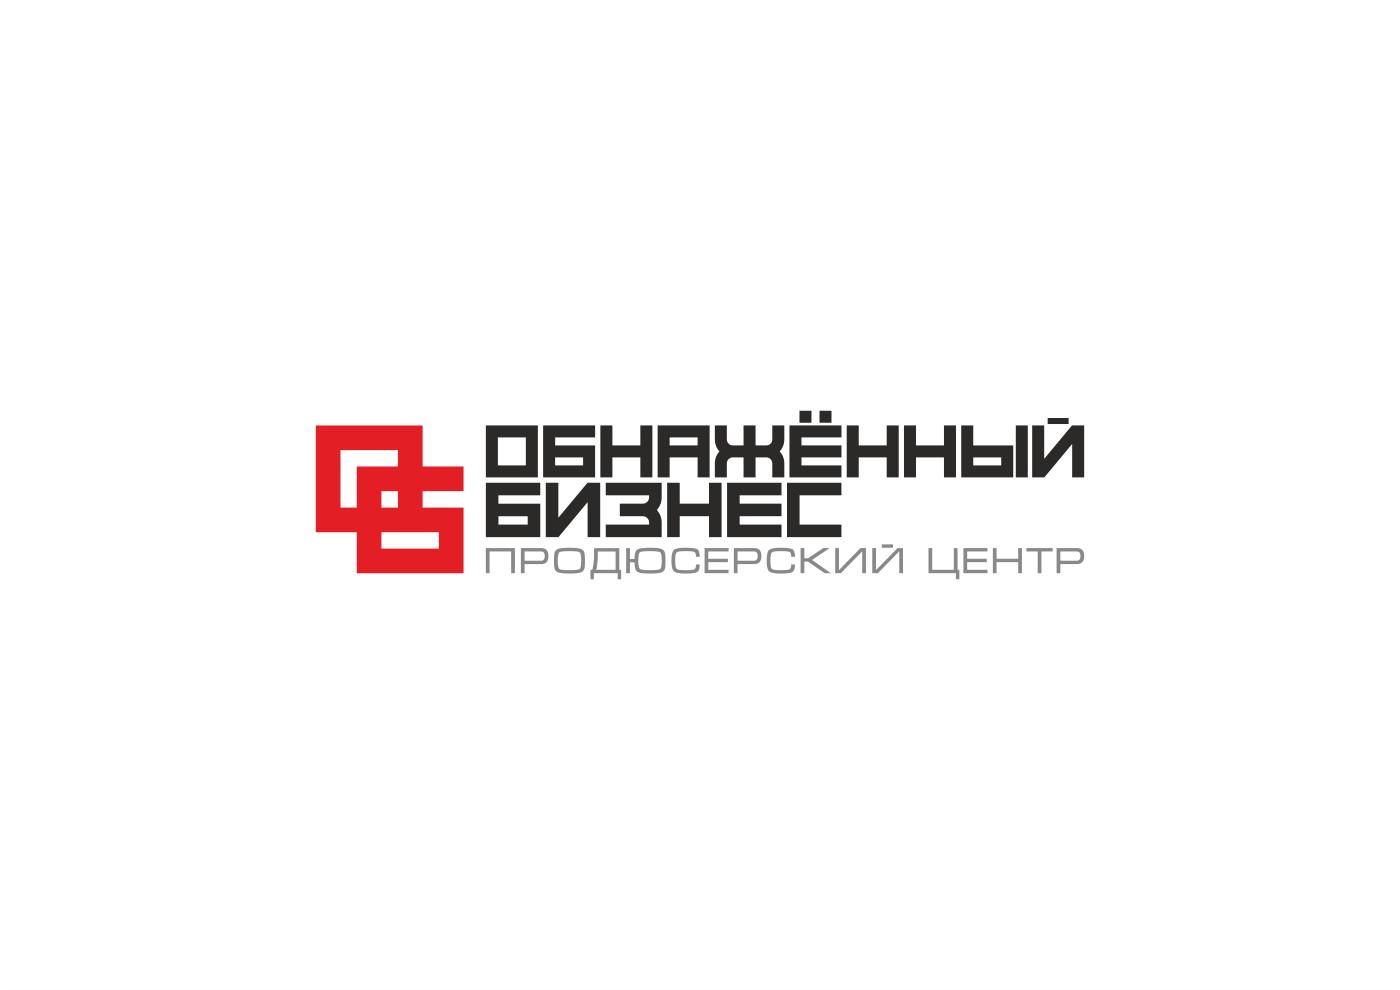 "Логотип для продюсерского центра ""Обнажённый бизнес"" фото f_7135ba0bc44e8b0a.png"